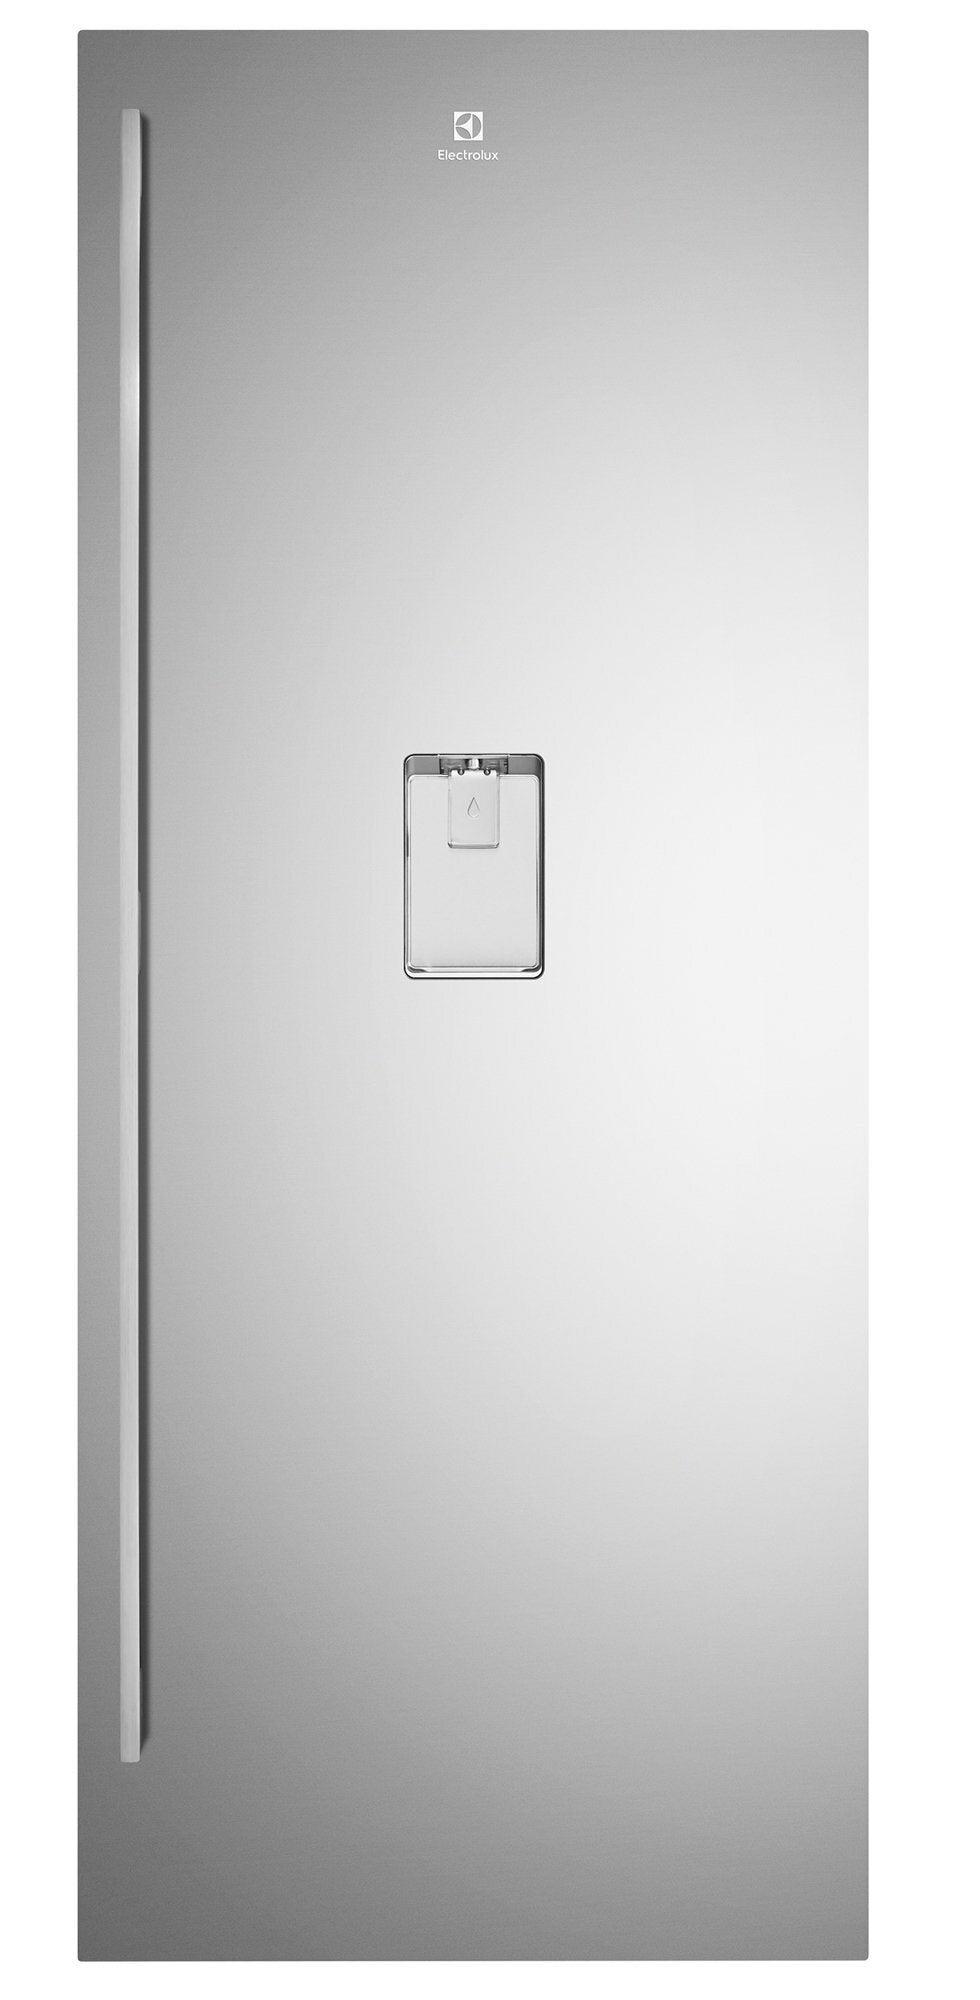 Electrolux ERE5047SC-R Refrigerator